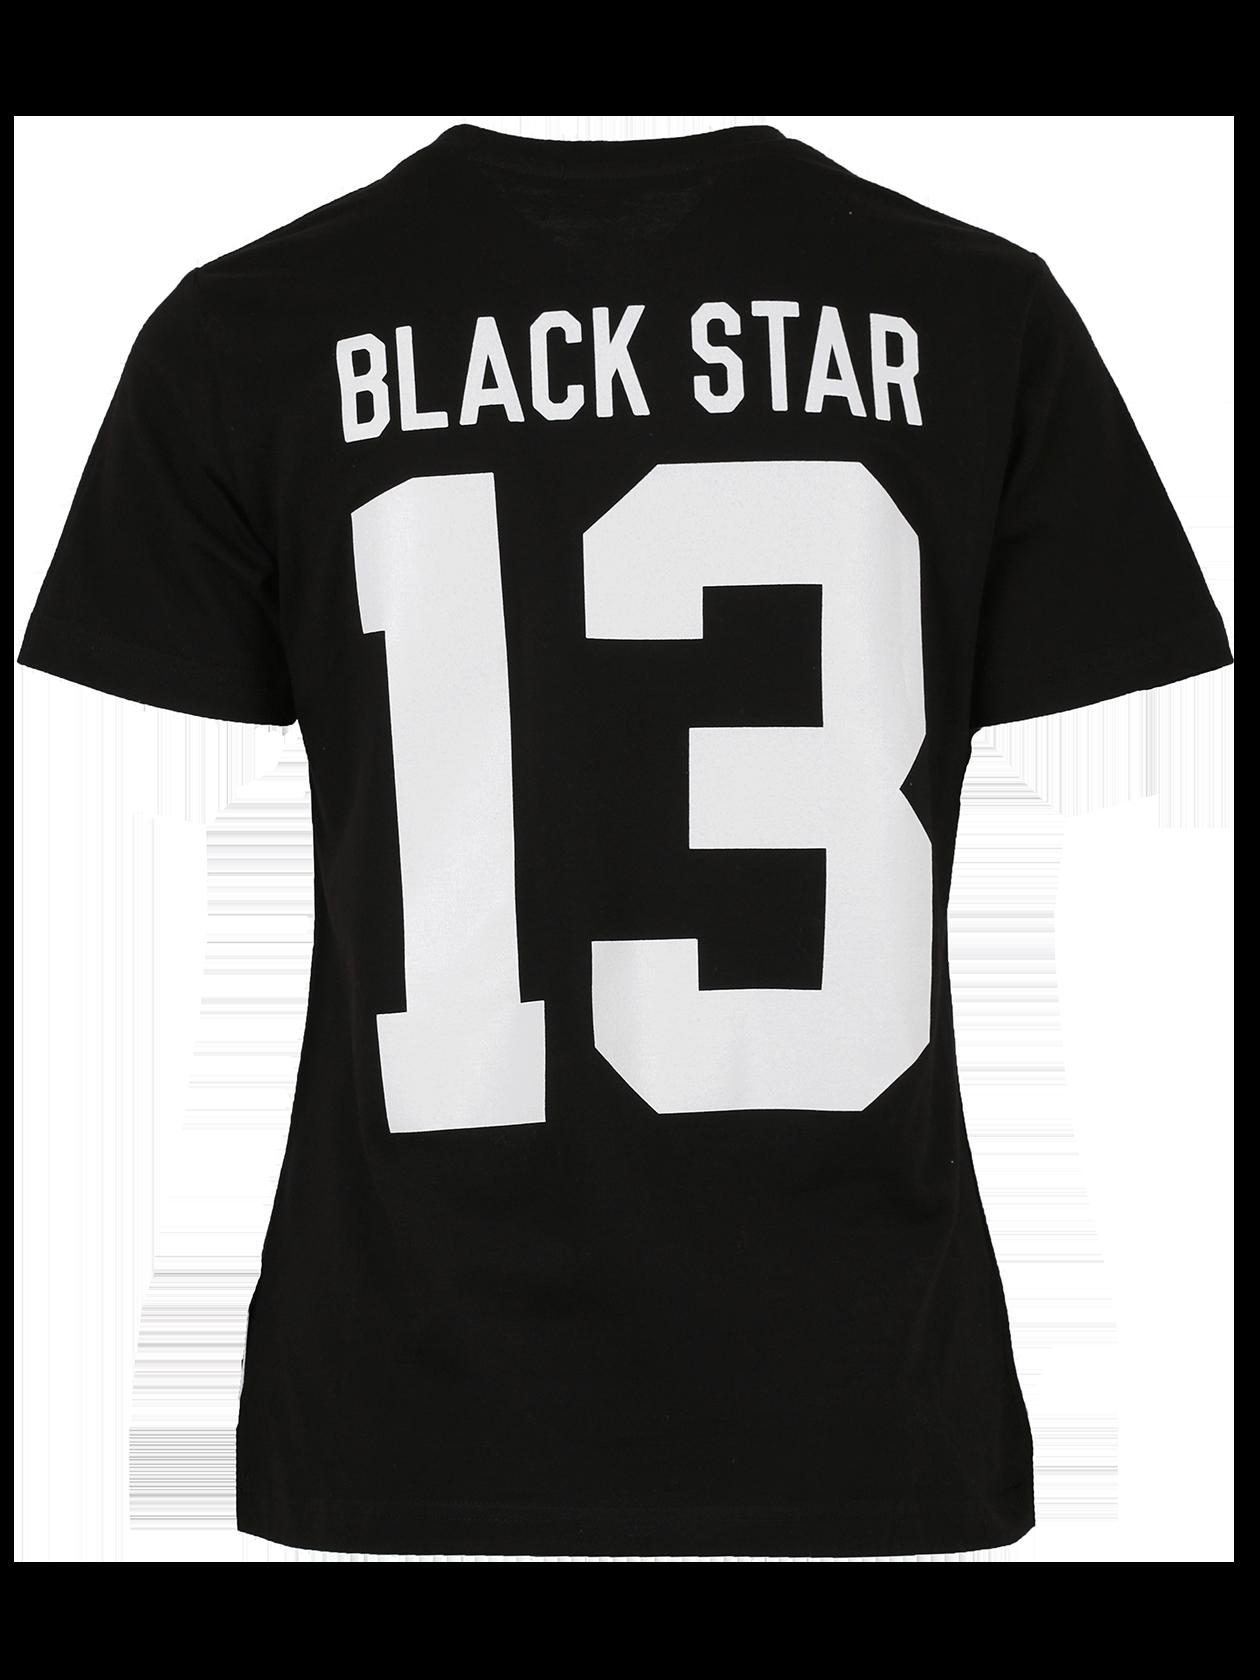 Футболка женская BLACK STAR 13